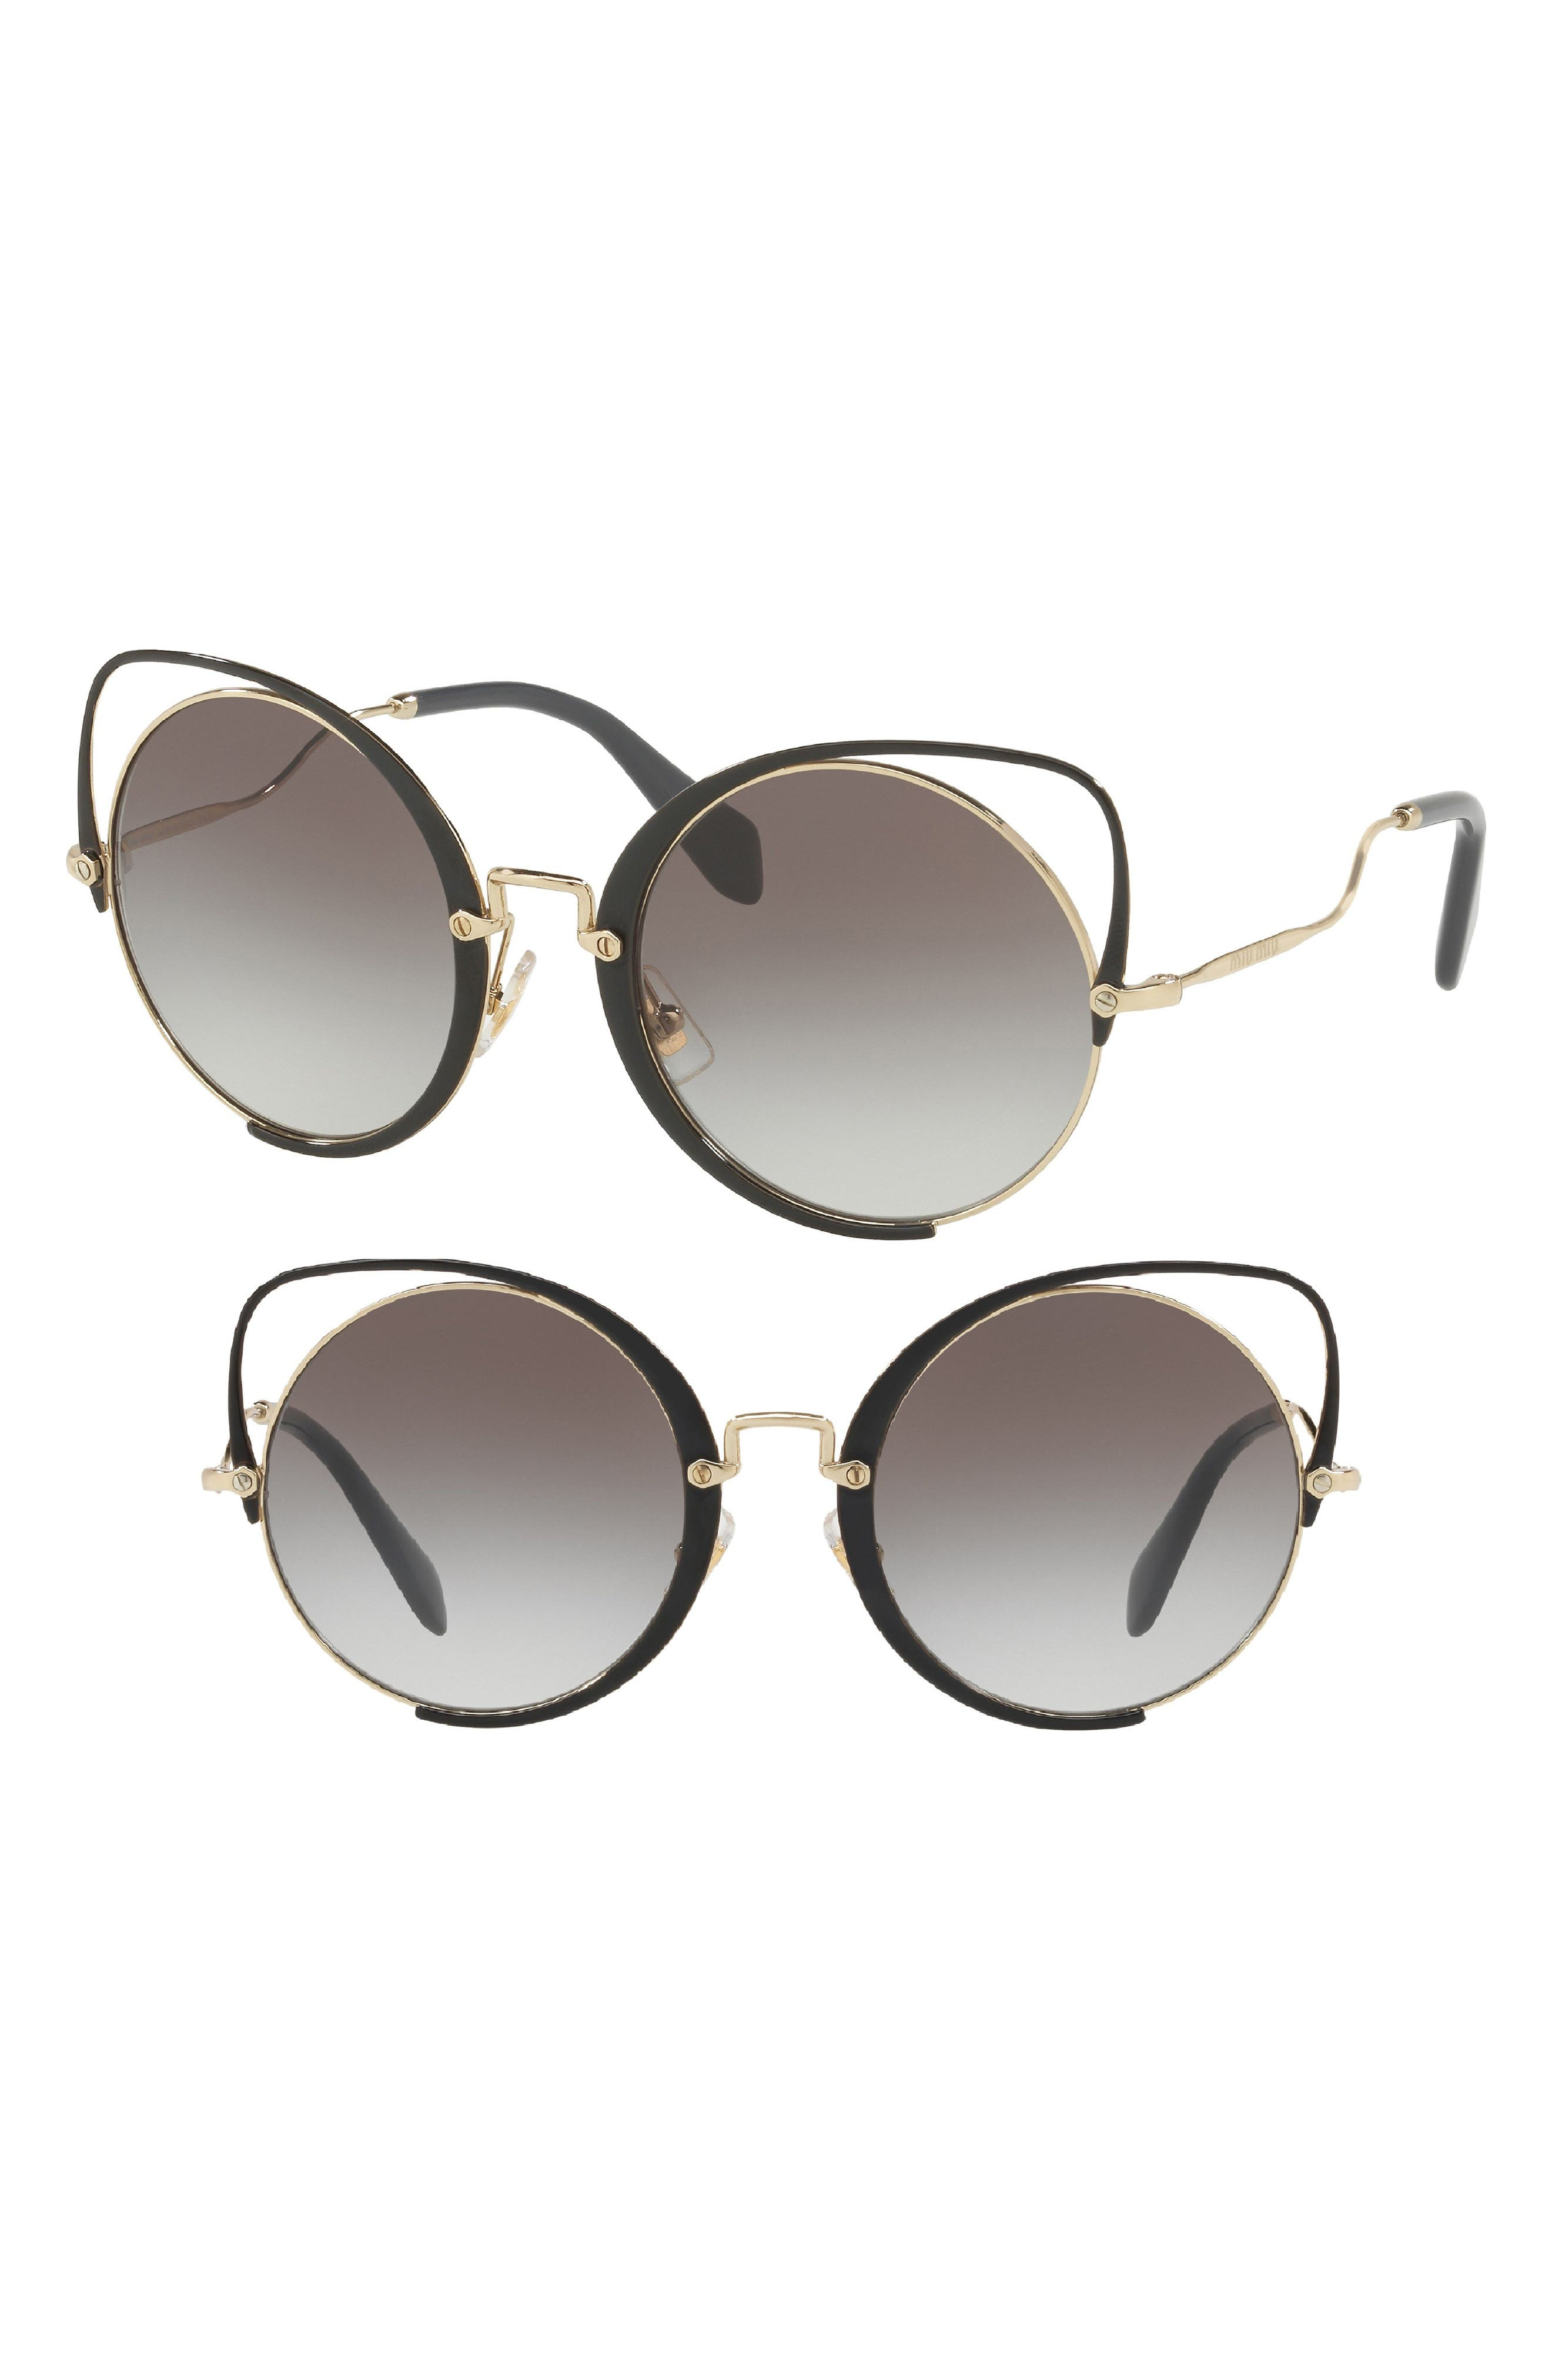 54mm Gradient Round Lens Cat Eye Sunglasses,                         Main,                         color, 010